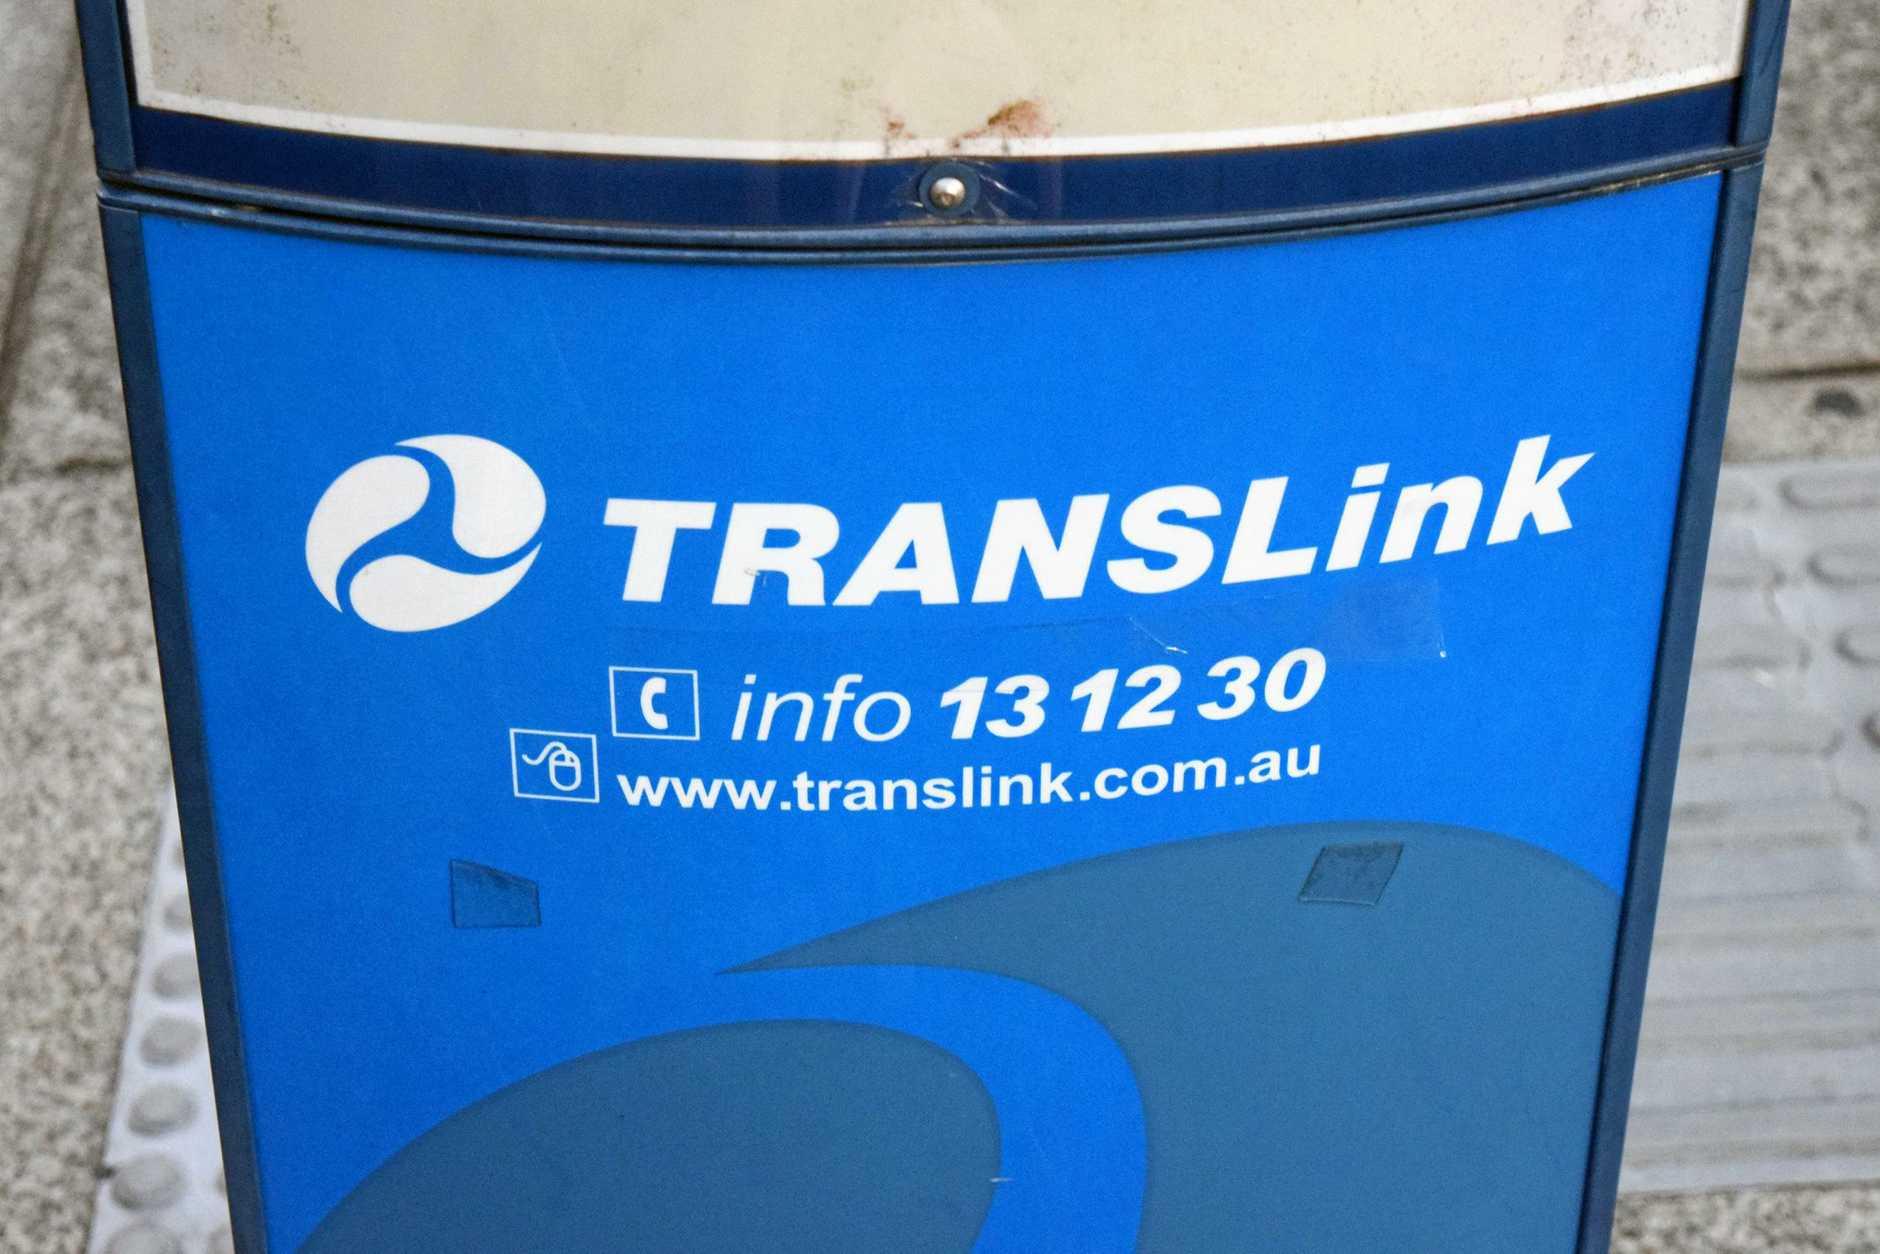 Translink bus stop in Brisbane.